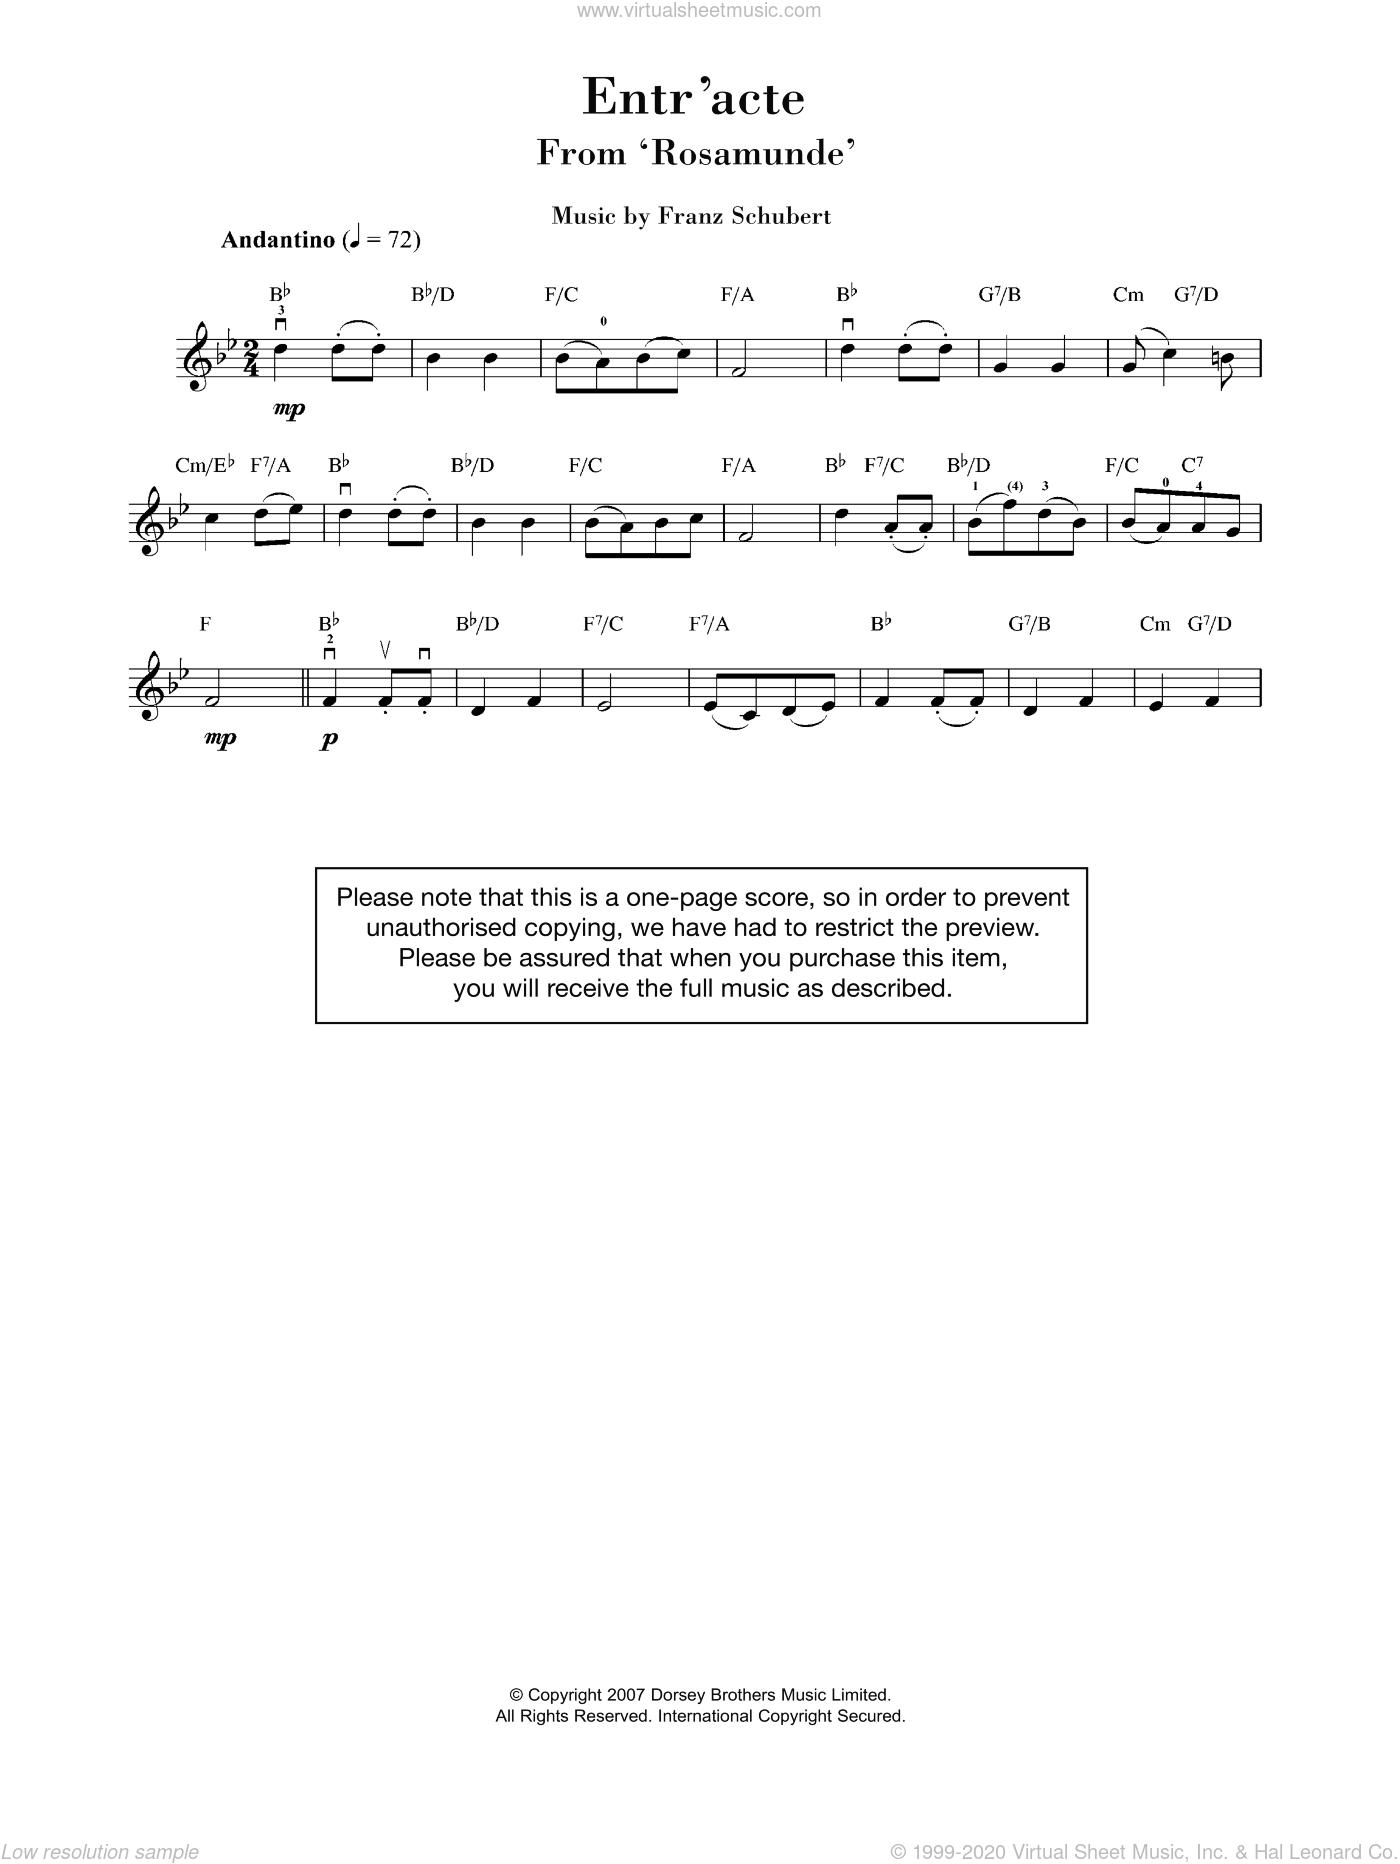 Rosamunde Entr'acte sheet music for violin solo by Franz Schubert, classical score, intermediate skill level